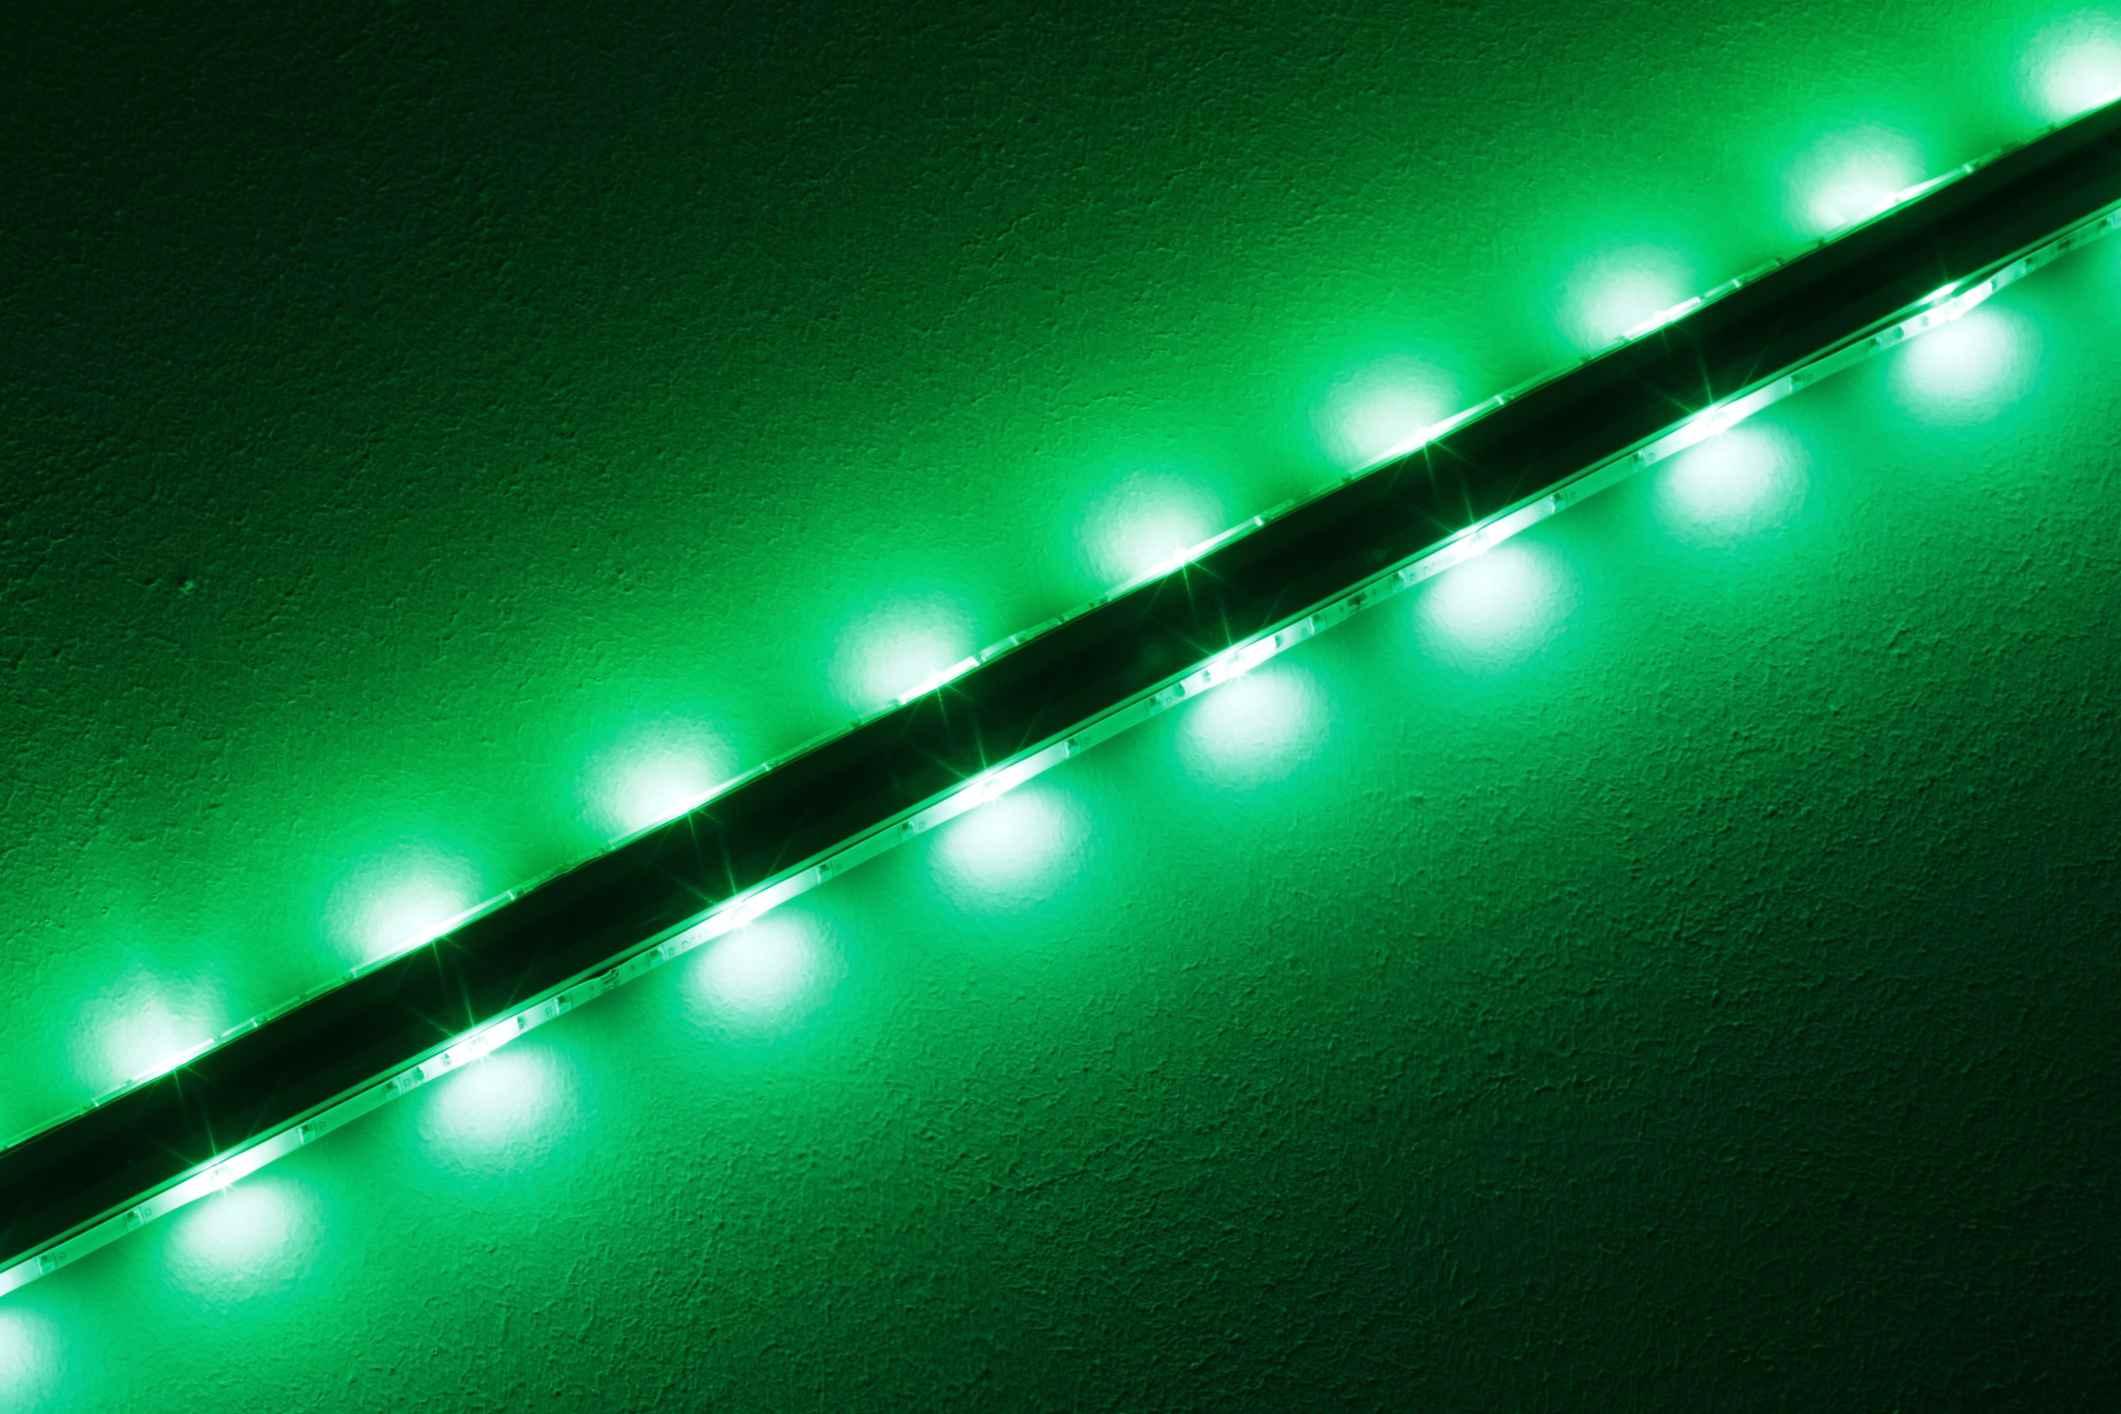 Closeup of green-glowing LED light strip